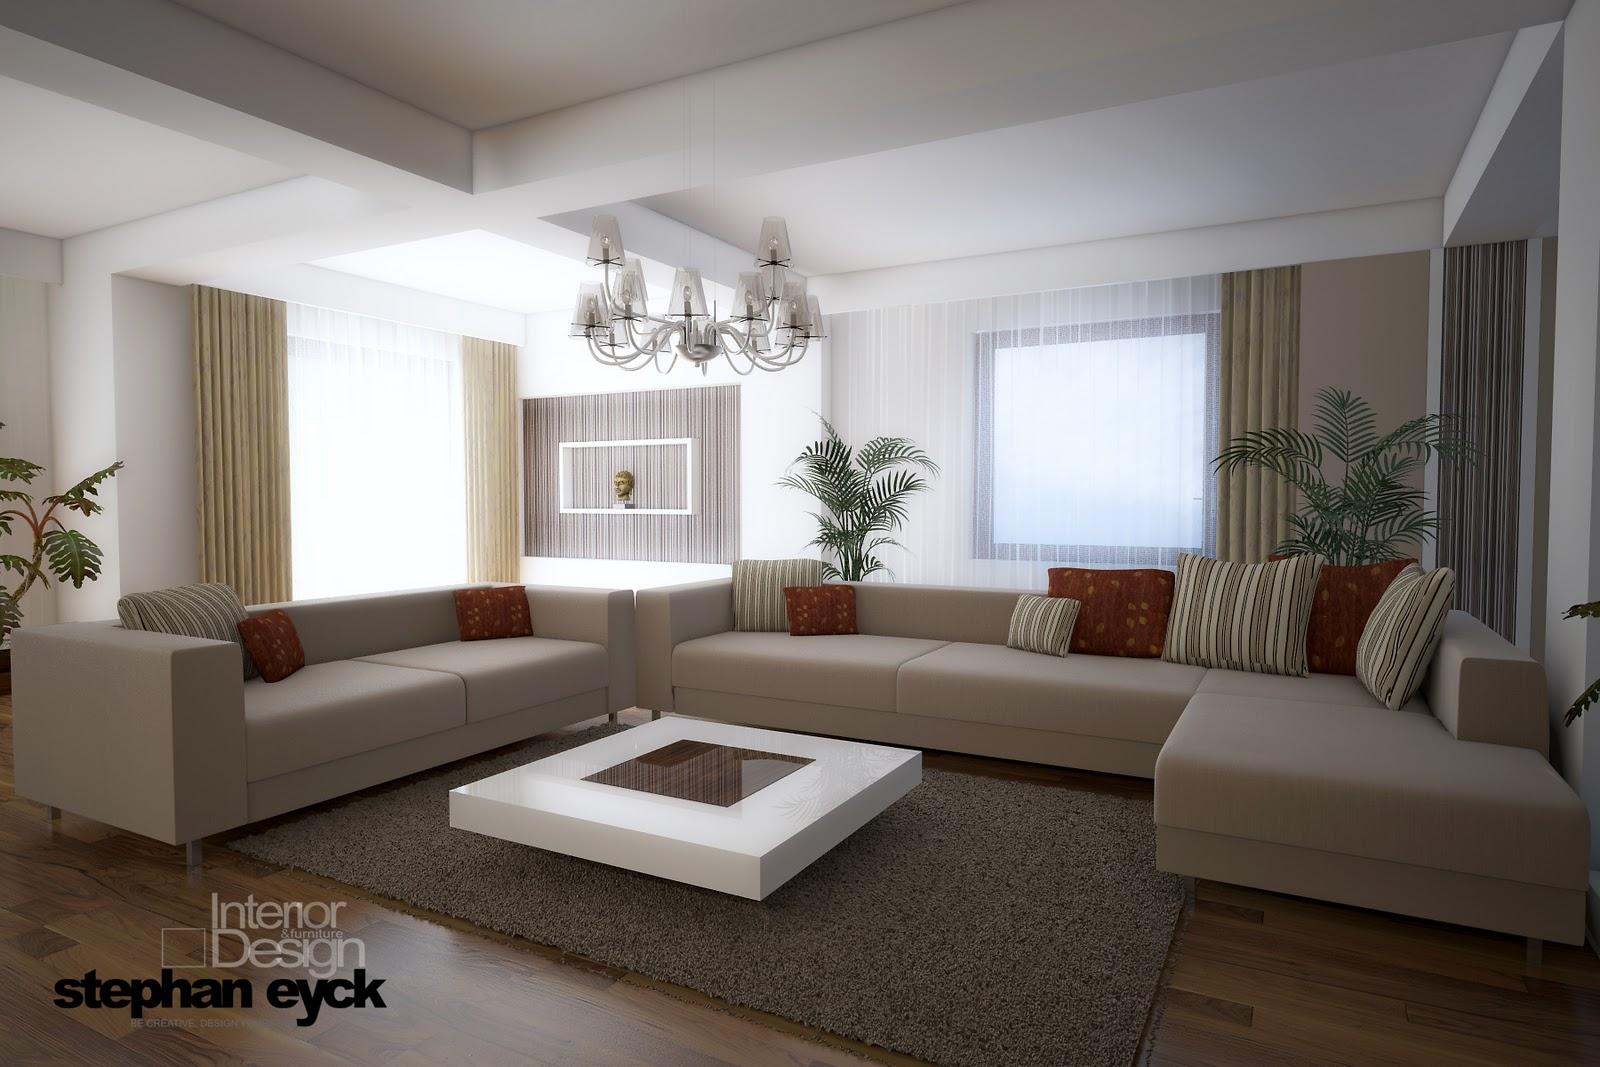 Dizain wallpaper joy studio design gallery best design for Dizain home